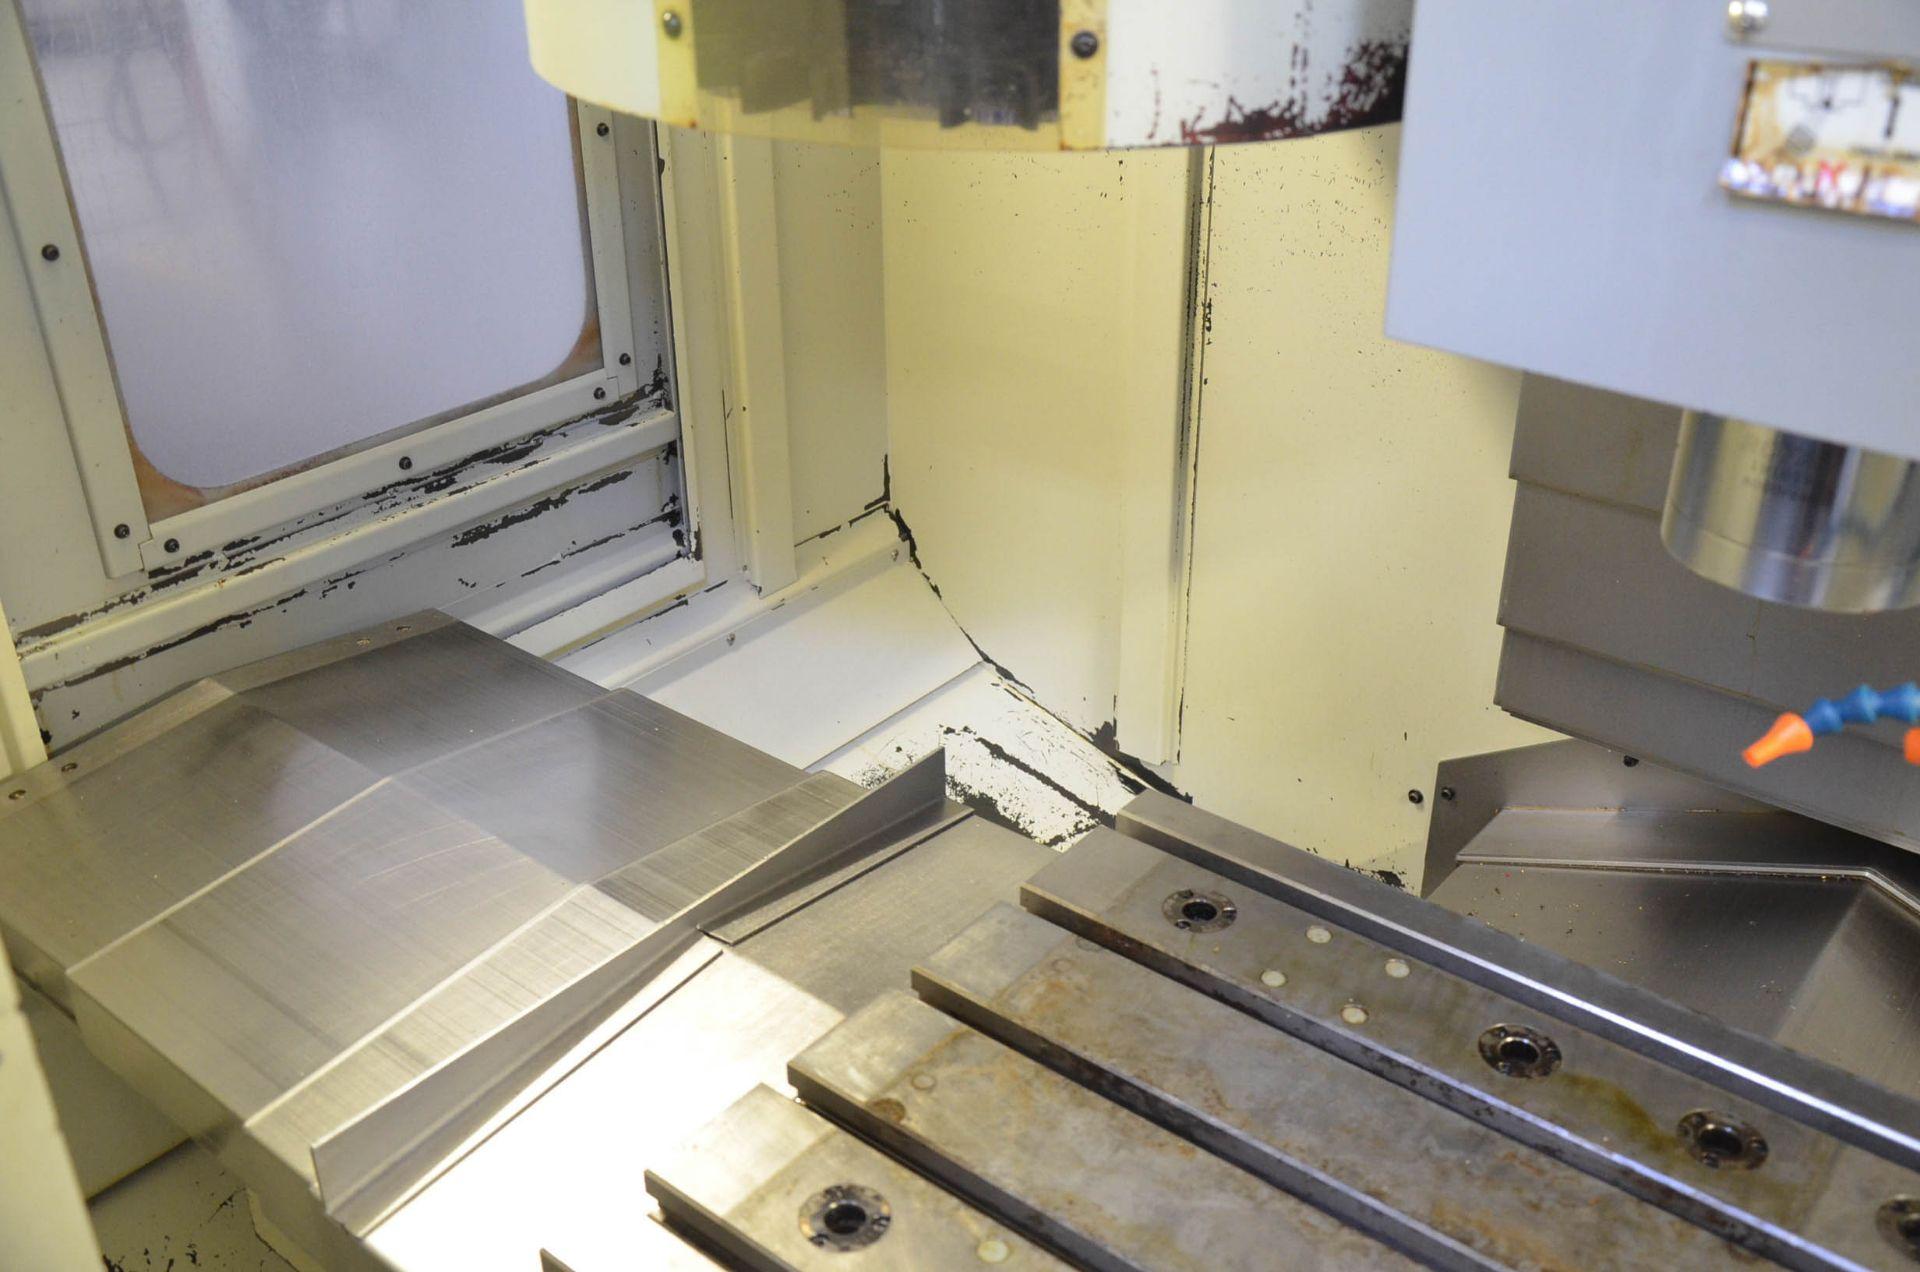 "SWI (2014) TRAK LPM CNC VERTICAL MACHINING CENTER WITH PROTO TRAK PMX CNC CONTROL, 19.5"" X 35.5"" - Image 7 of 9"